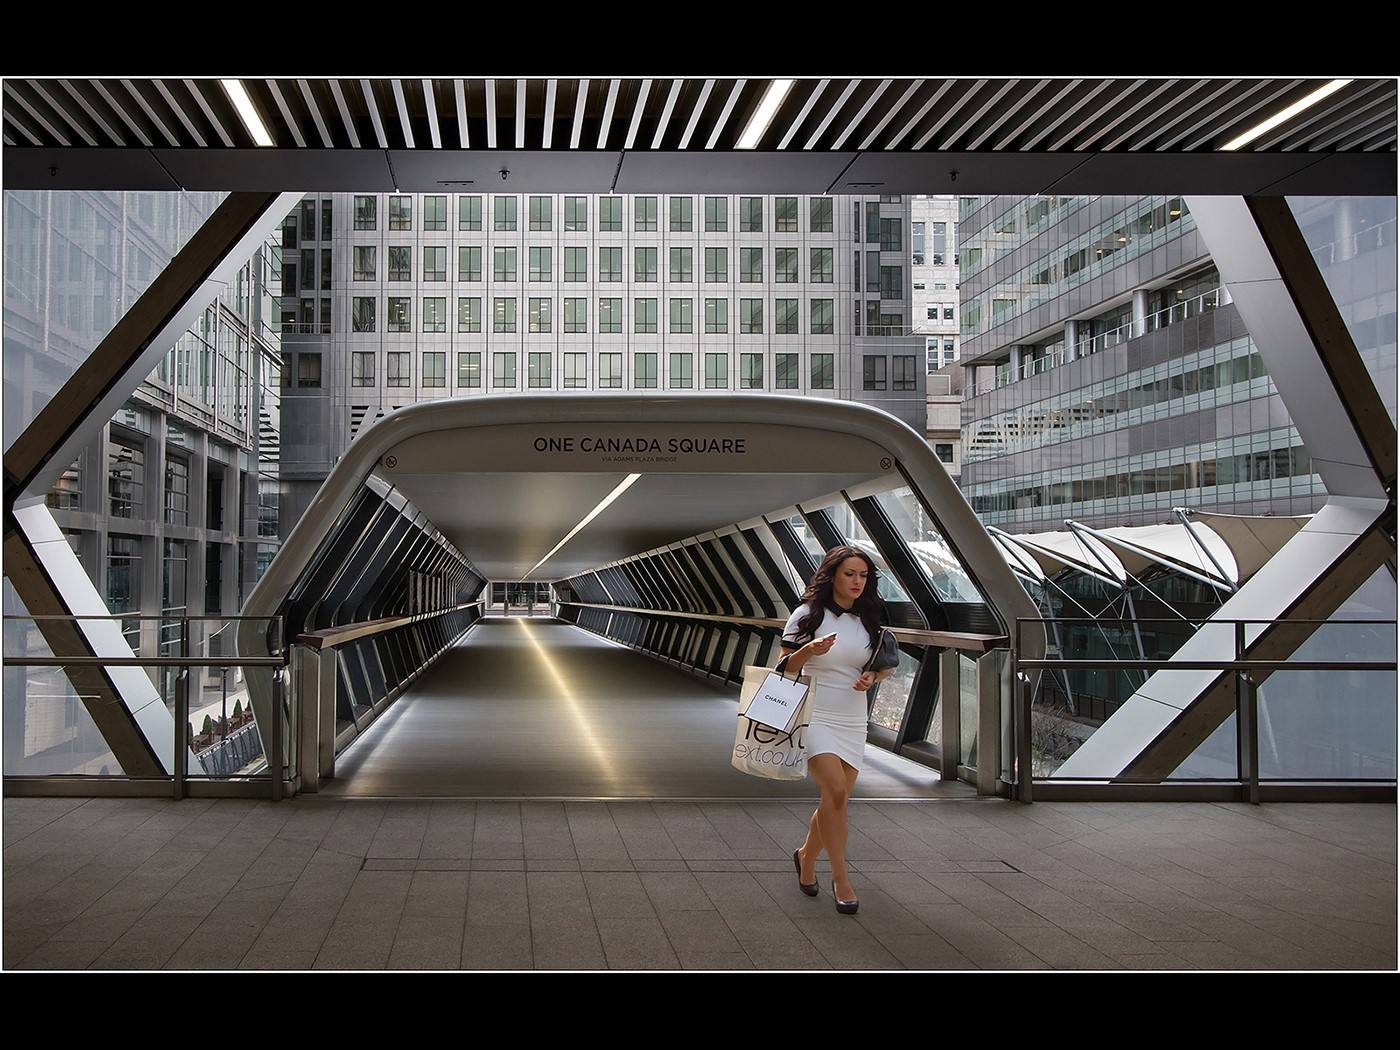 Canary Wharf - Entrance to Crossrail